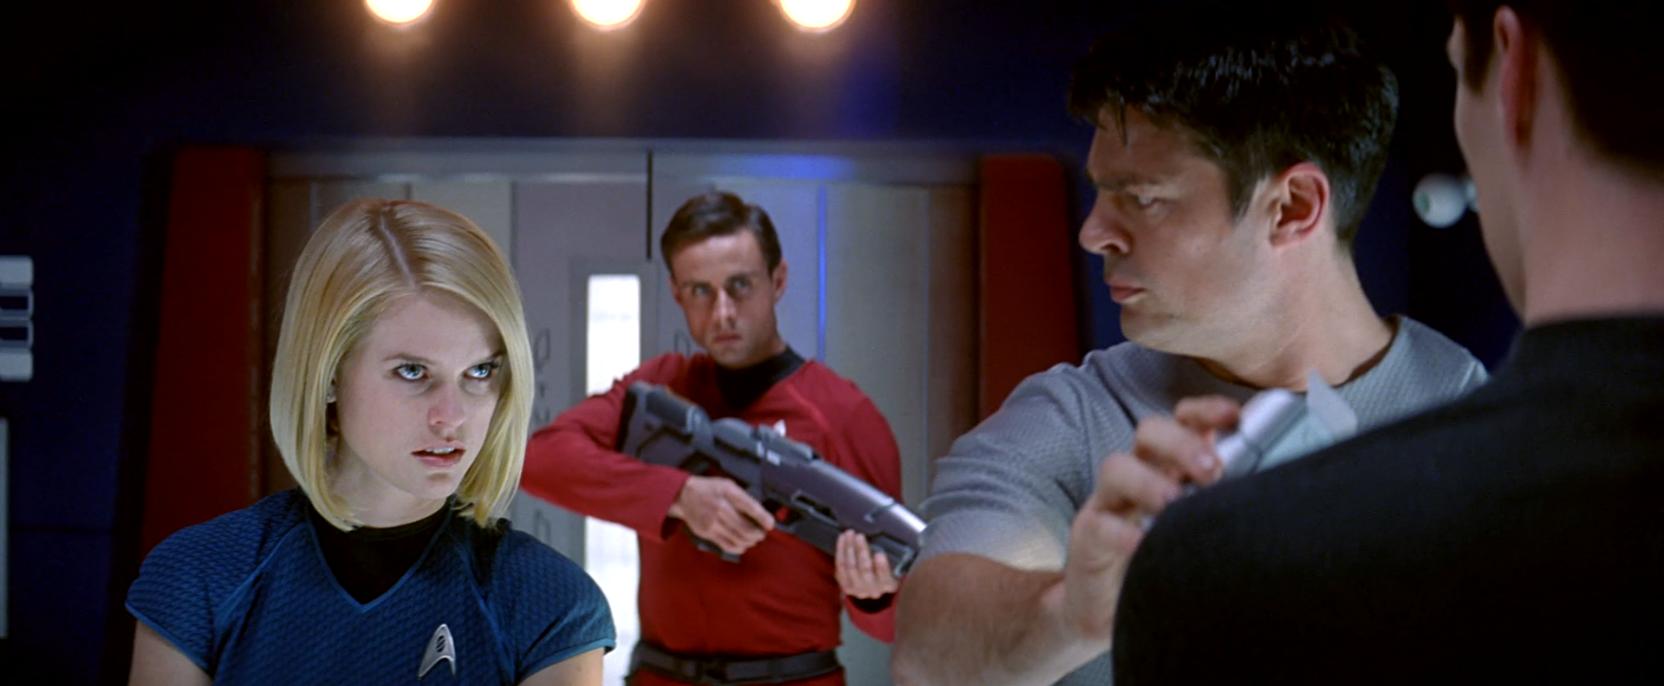 Bones (Karl Urban) and Carol Marcus (Alice Eve) in Star Trek Into Darkness